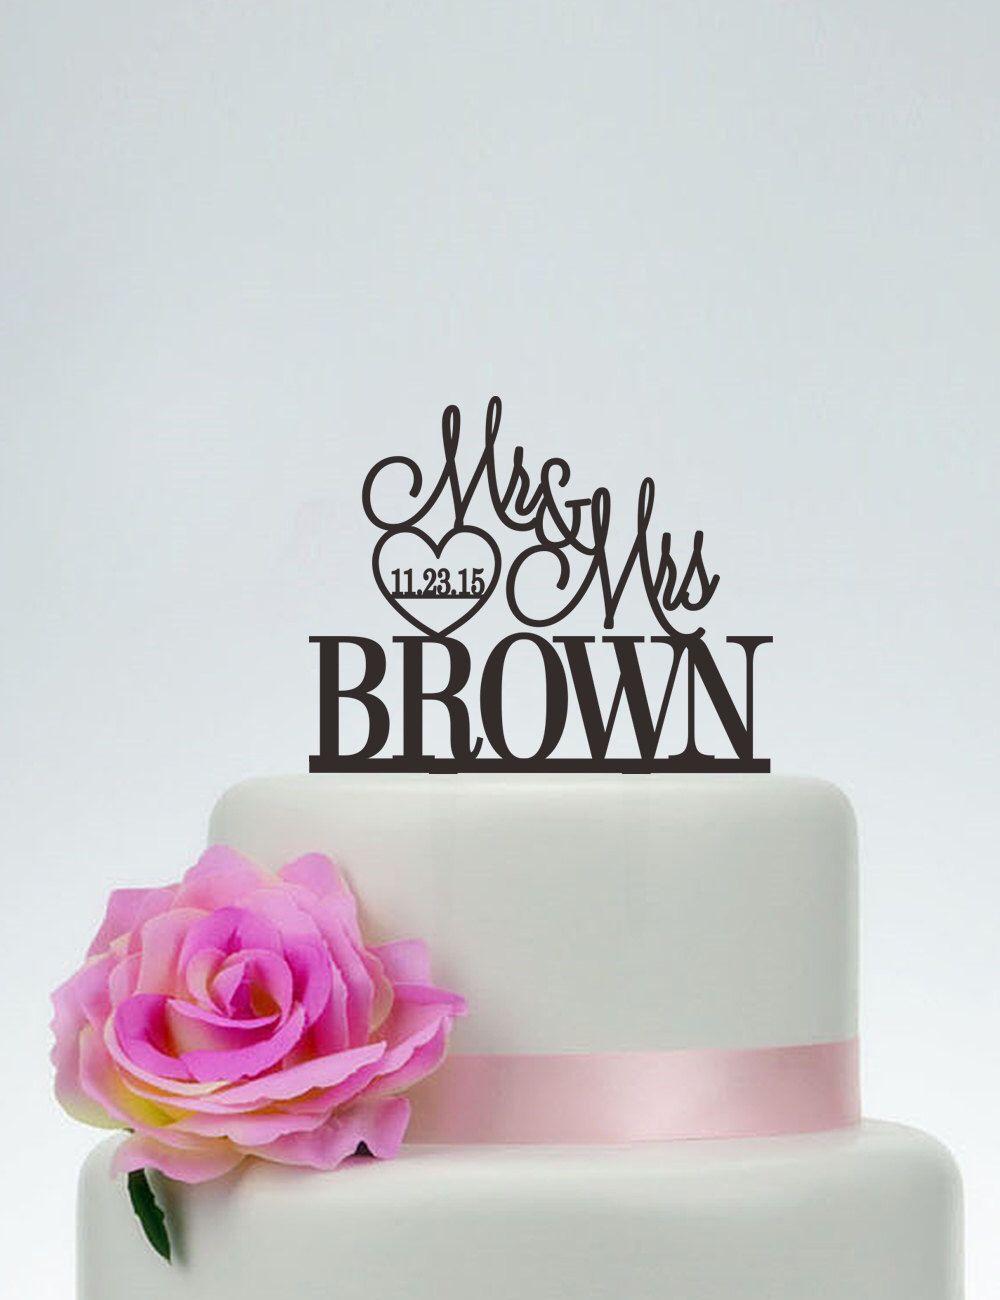 Mr and mrs cake topper with last namewedding cake toppercustom